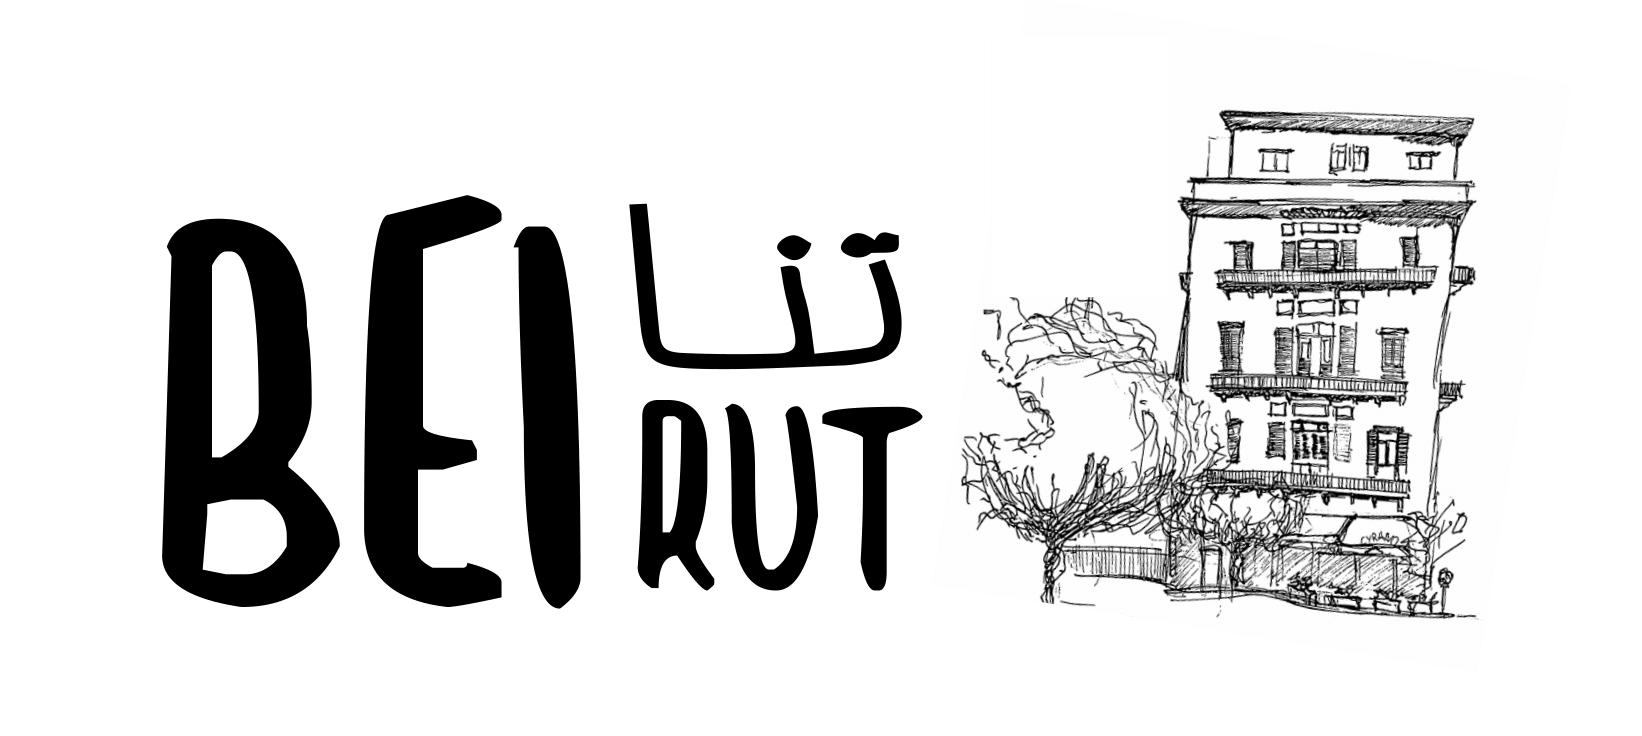 Beirut Beitna